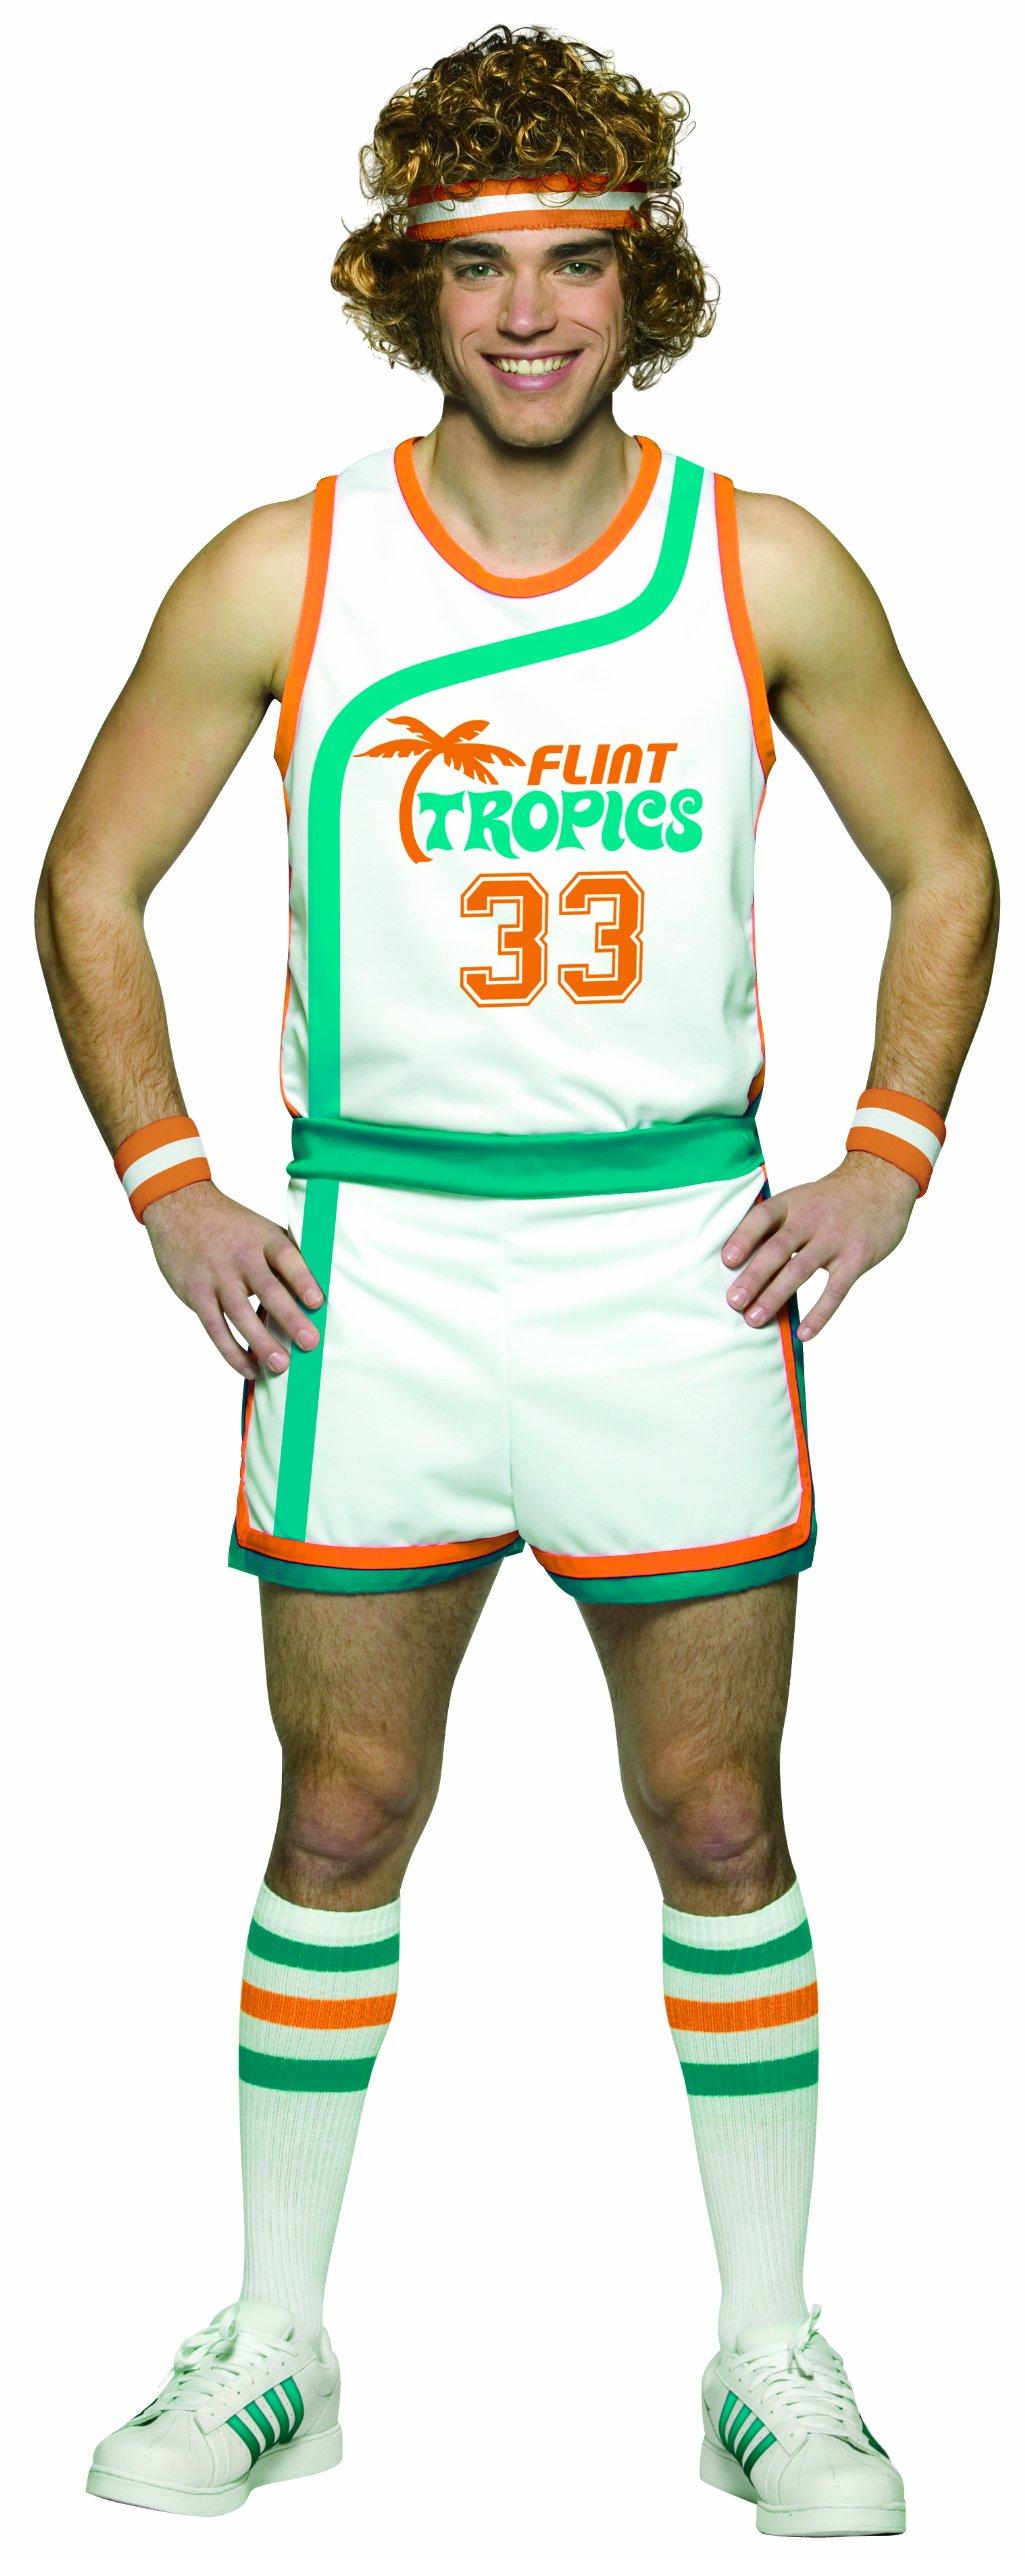 Rasta Imposta Semi Pro Uniform Costume, Multi-Colored, One Size by Rasta Imposta